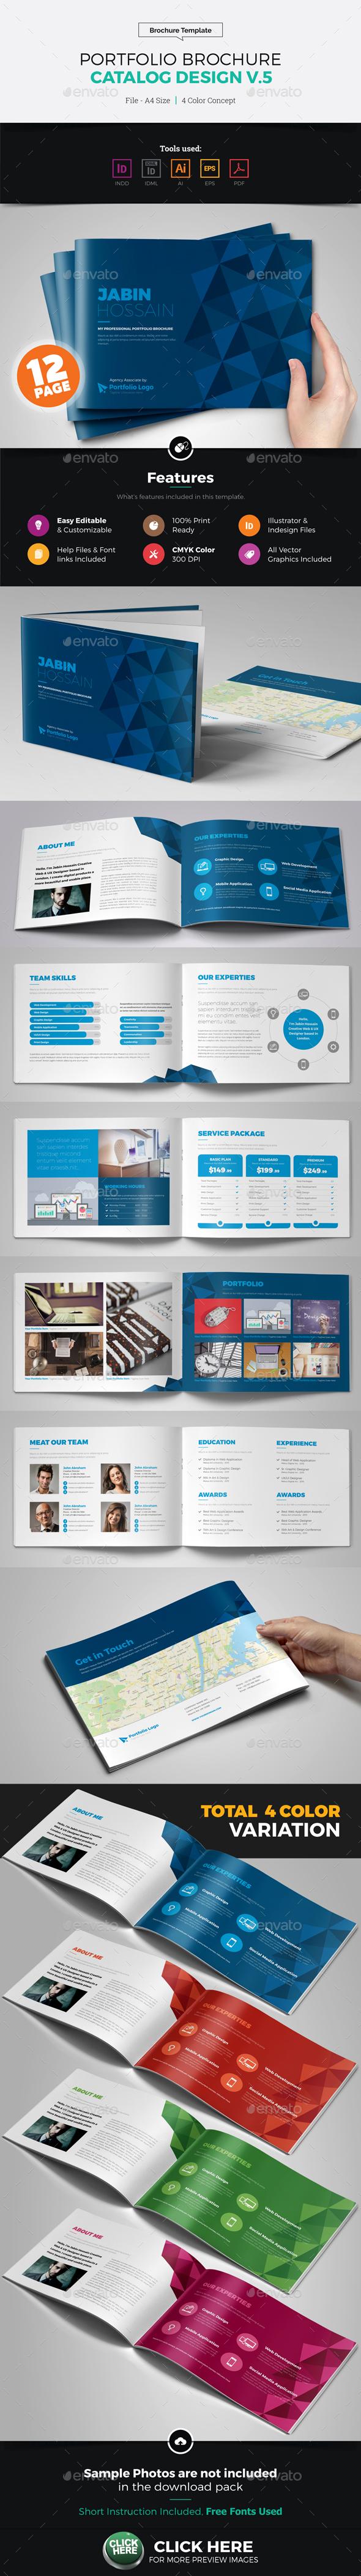 Portfolio Brochure Catalog Design v5 - Corporate Brochures